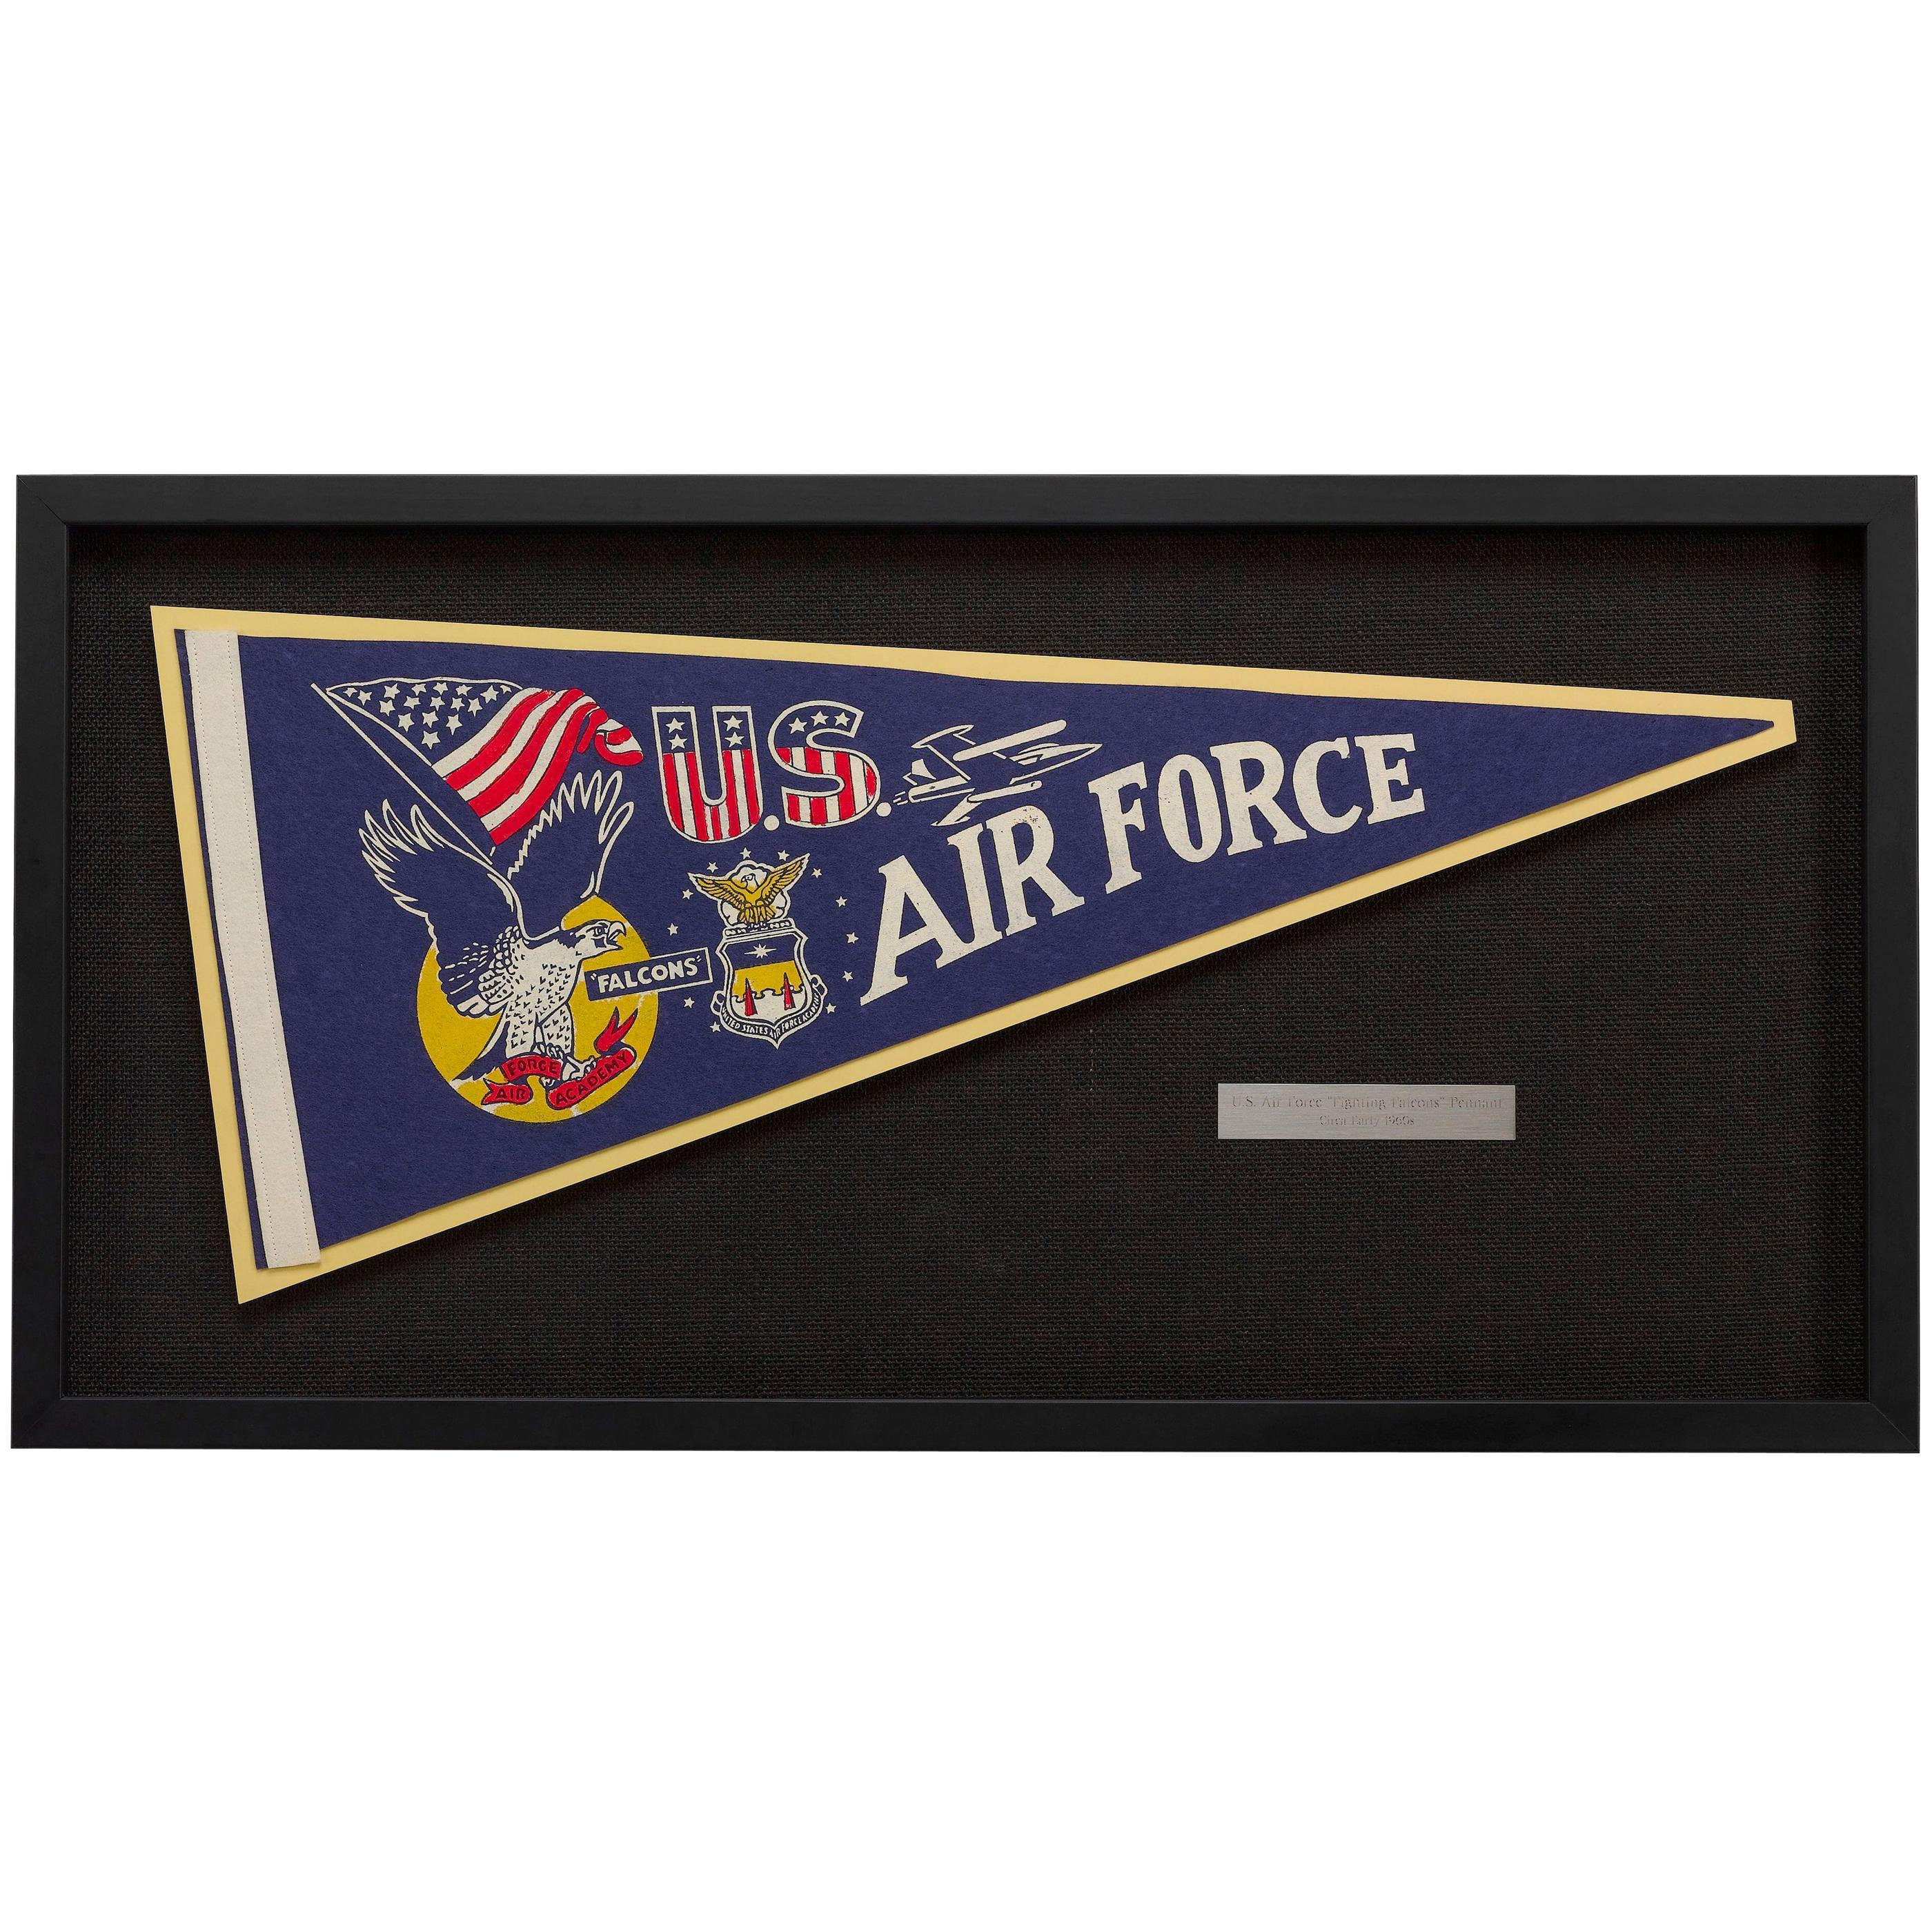 U.S. Air Force Academy Falcons Vintage Pennant, circa 1960s